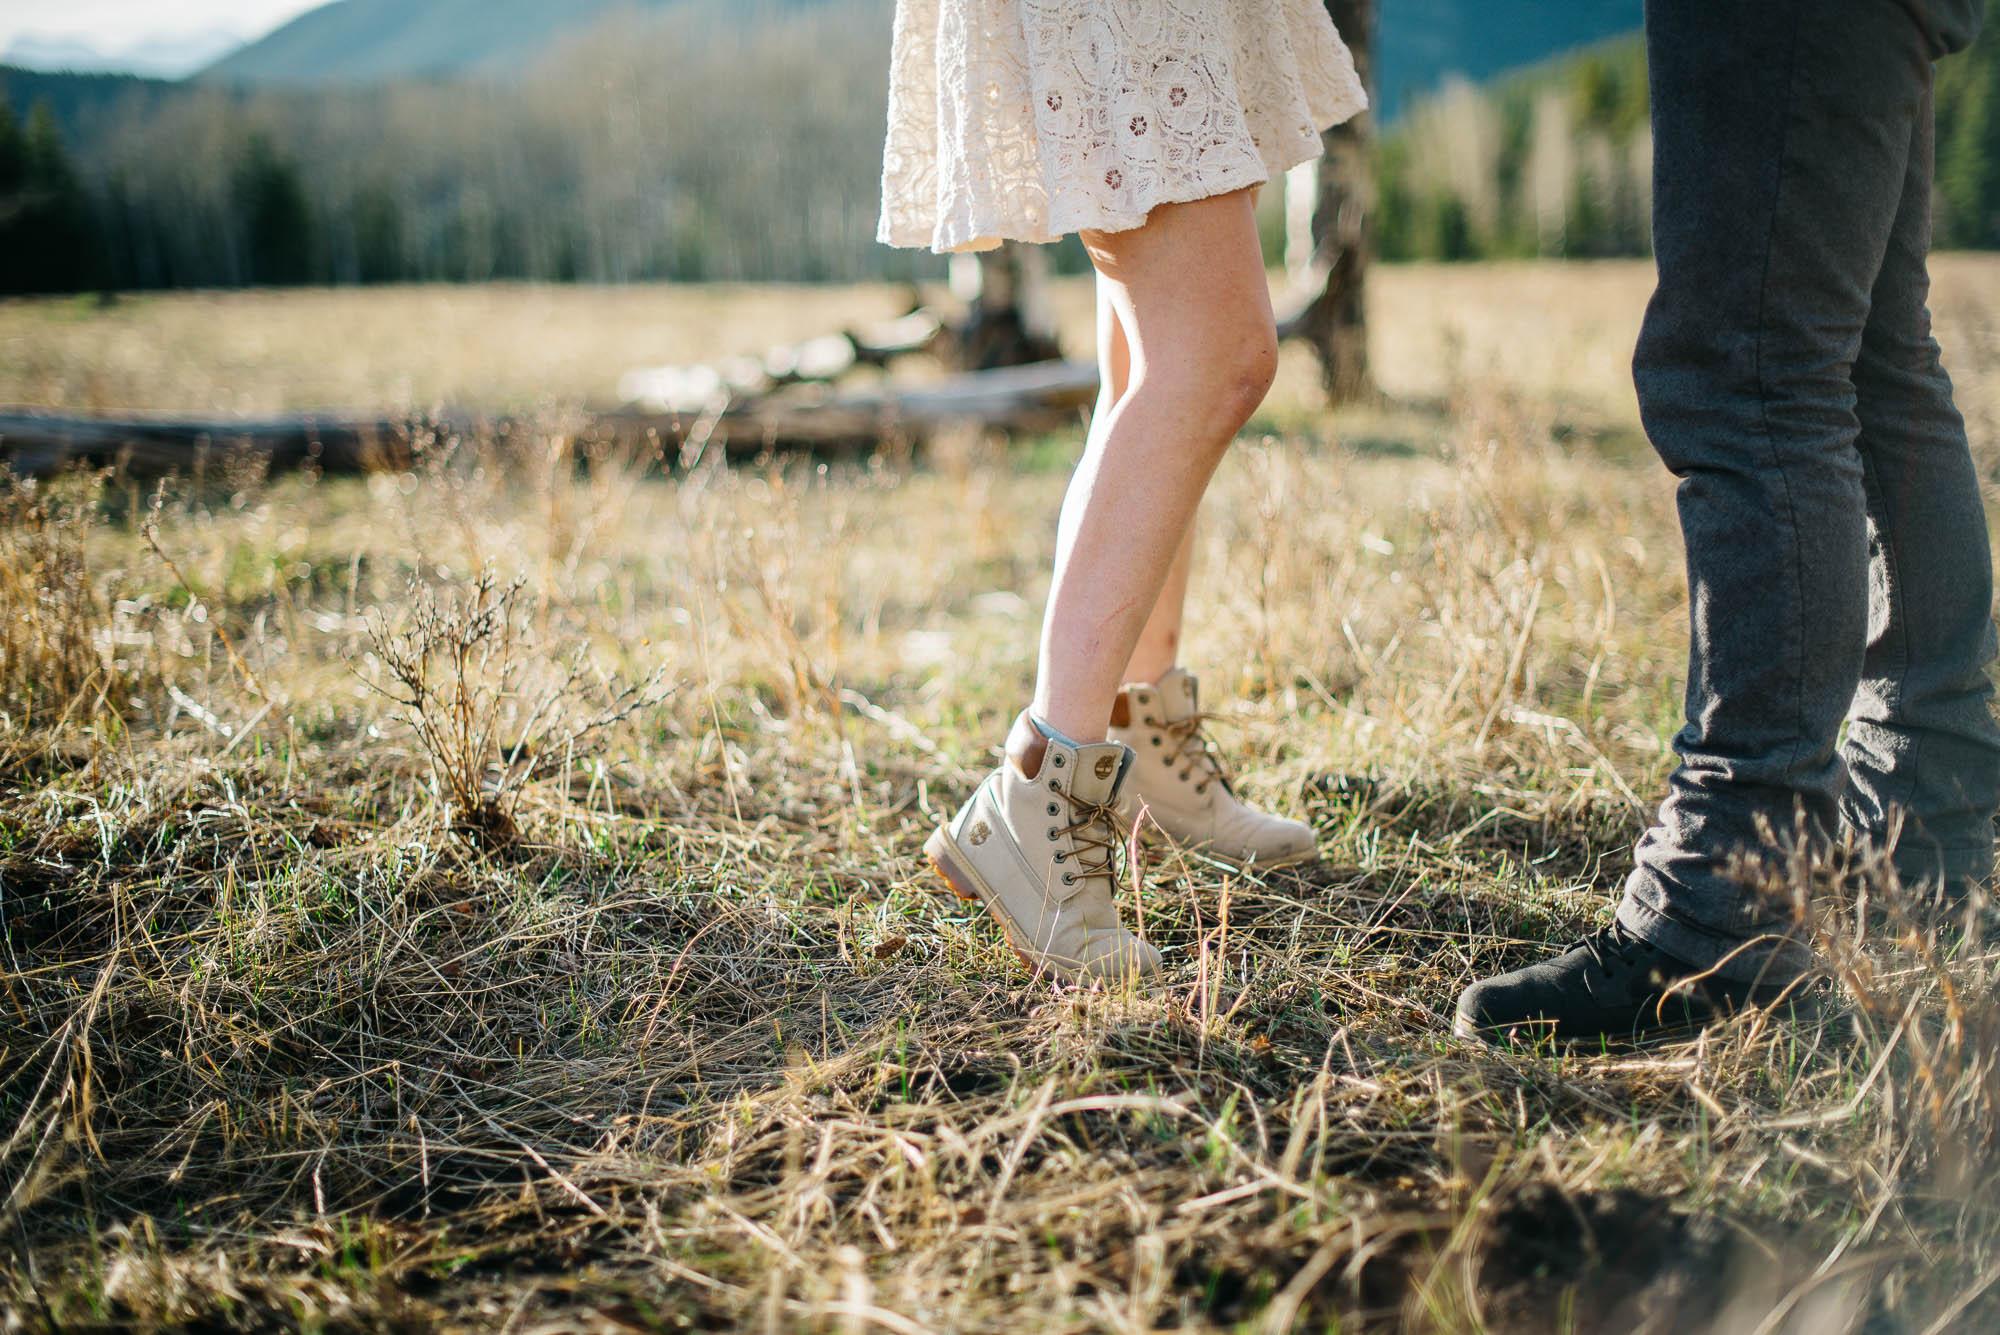 63-57couple-anniversary-engagement-photographer-colorado-romantic-photos-mountain-wedding-photographer-trevr&marissa-2016-2461.jpg